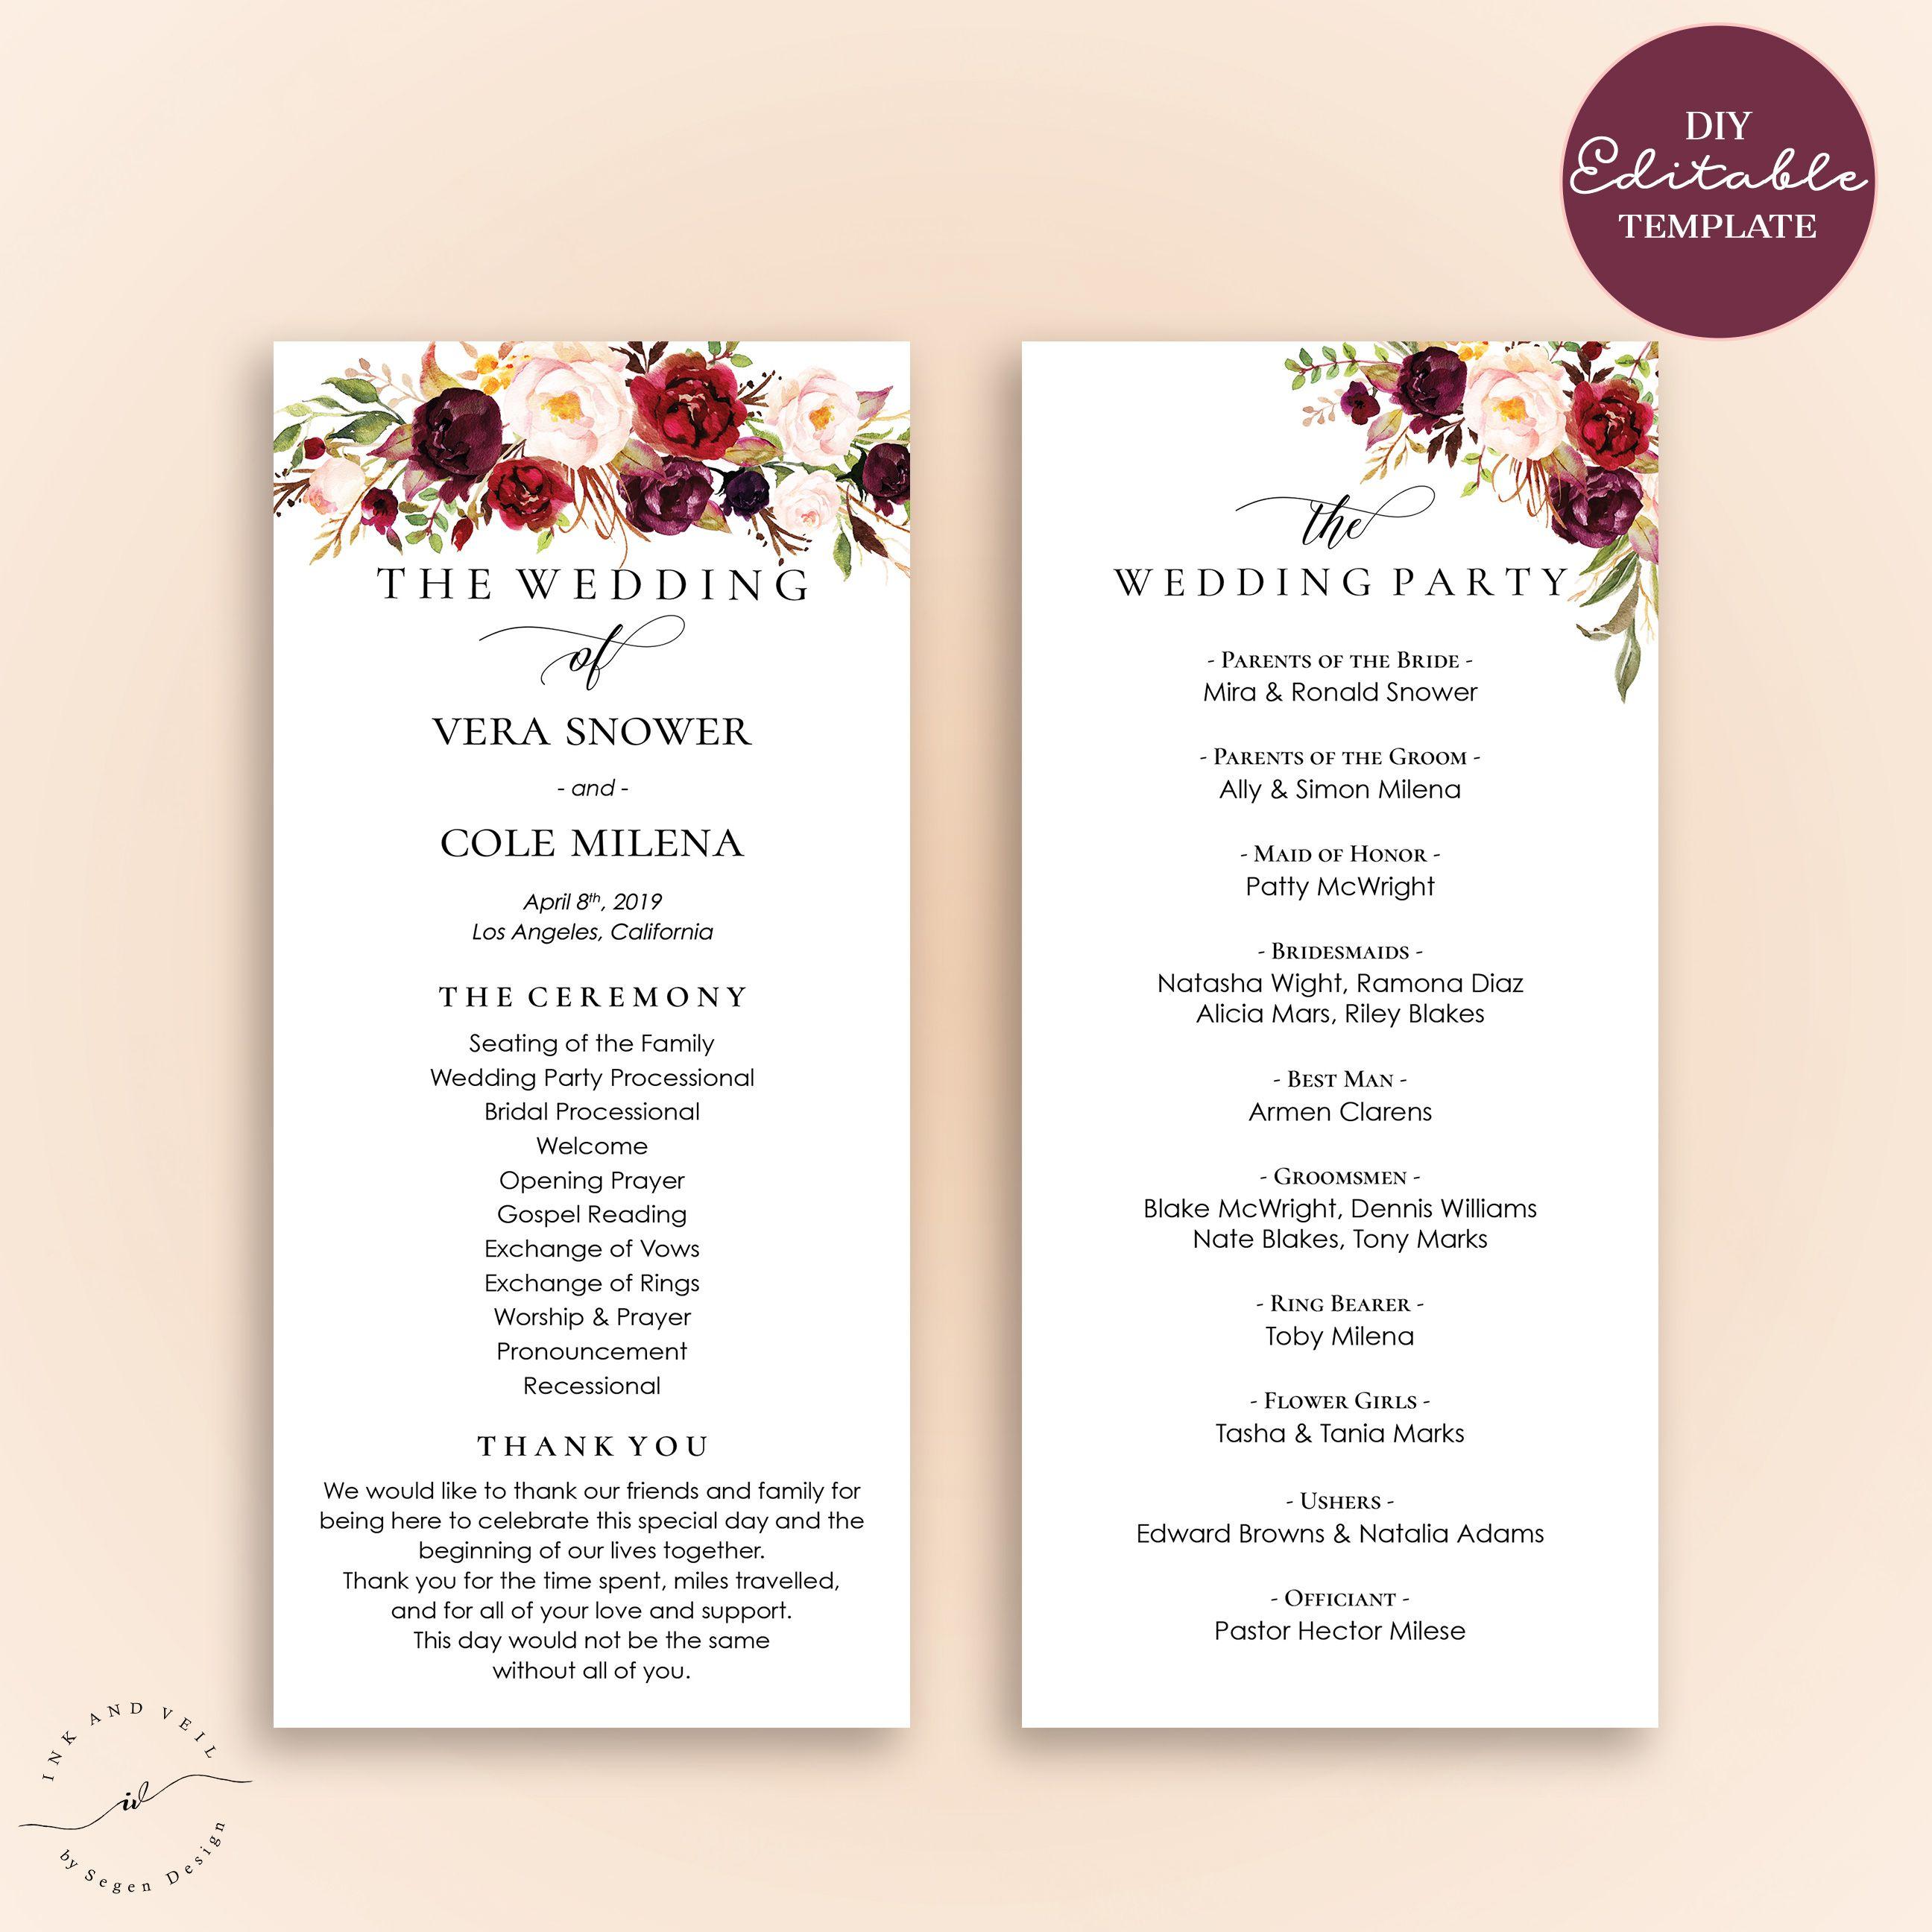 Printable Editable Wedding Program Template